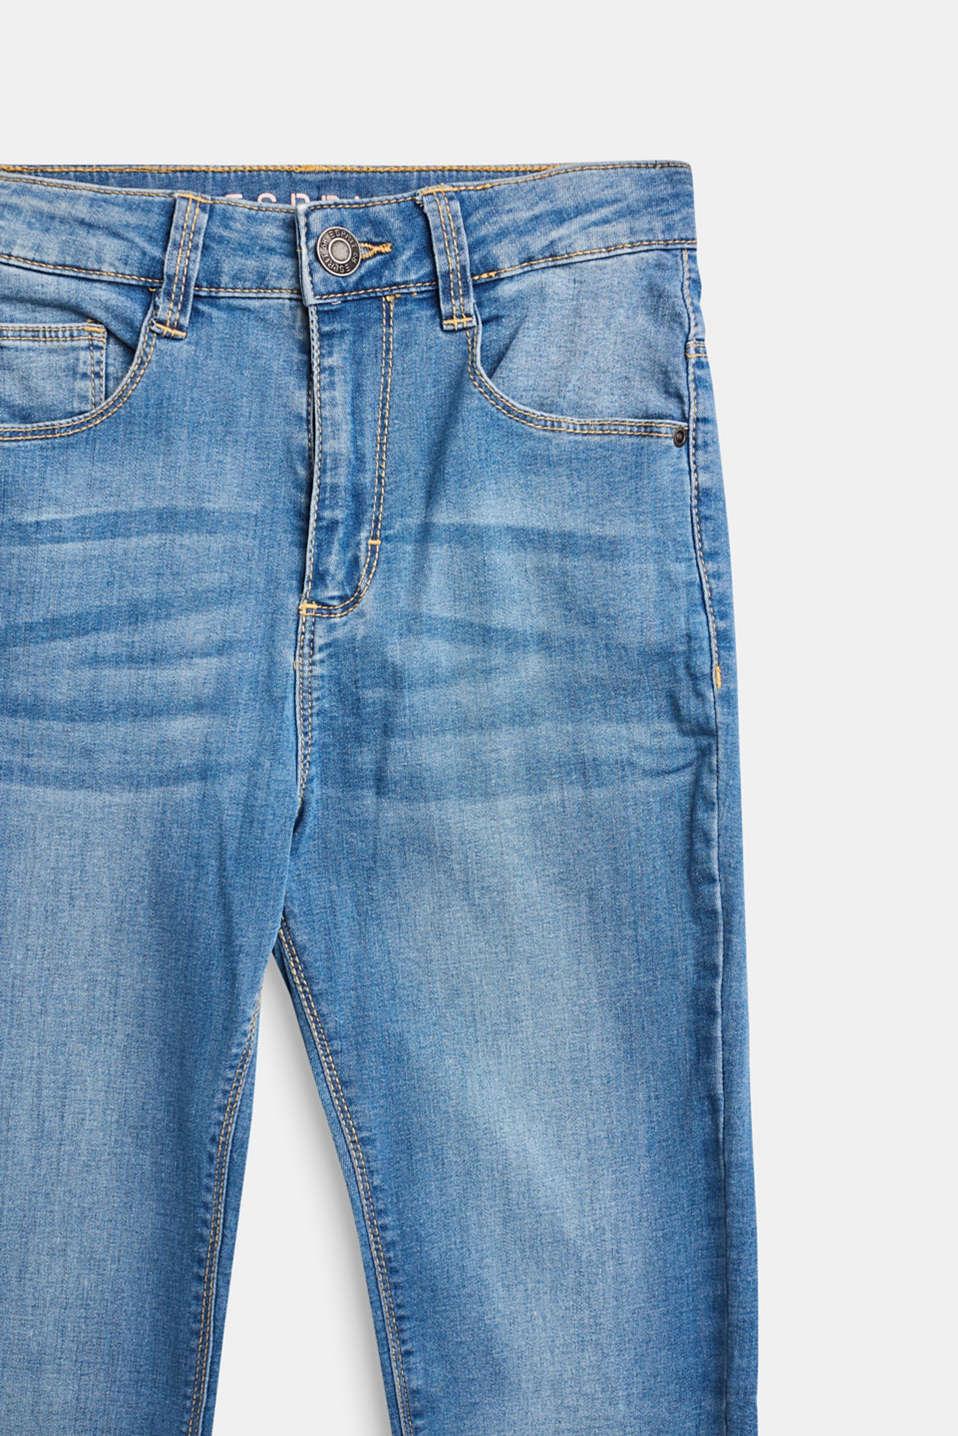 Pants denim, LCMEDIUM WASH DE, detail image number 3